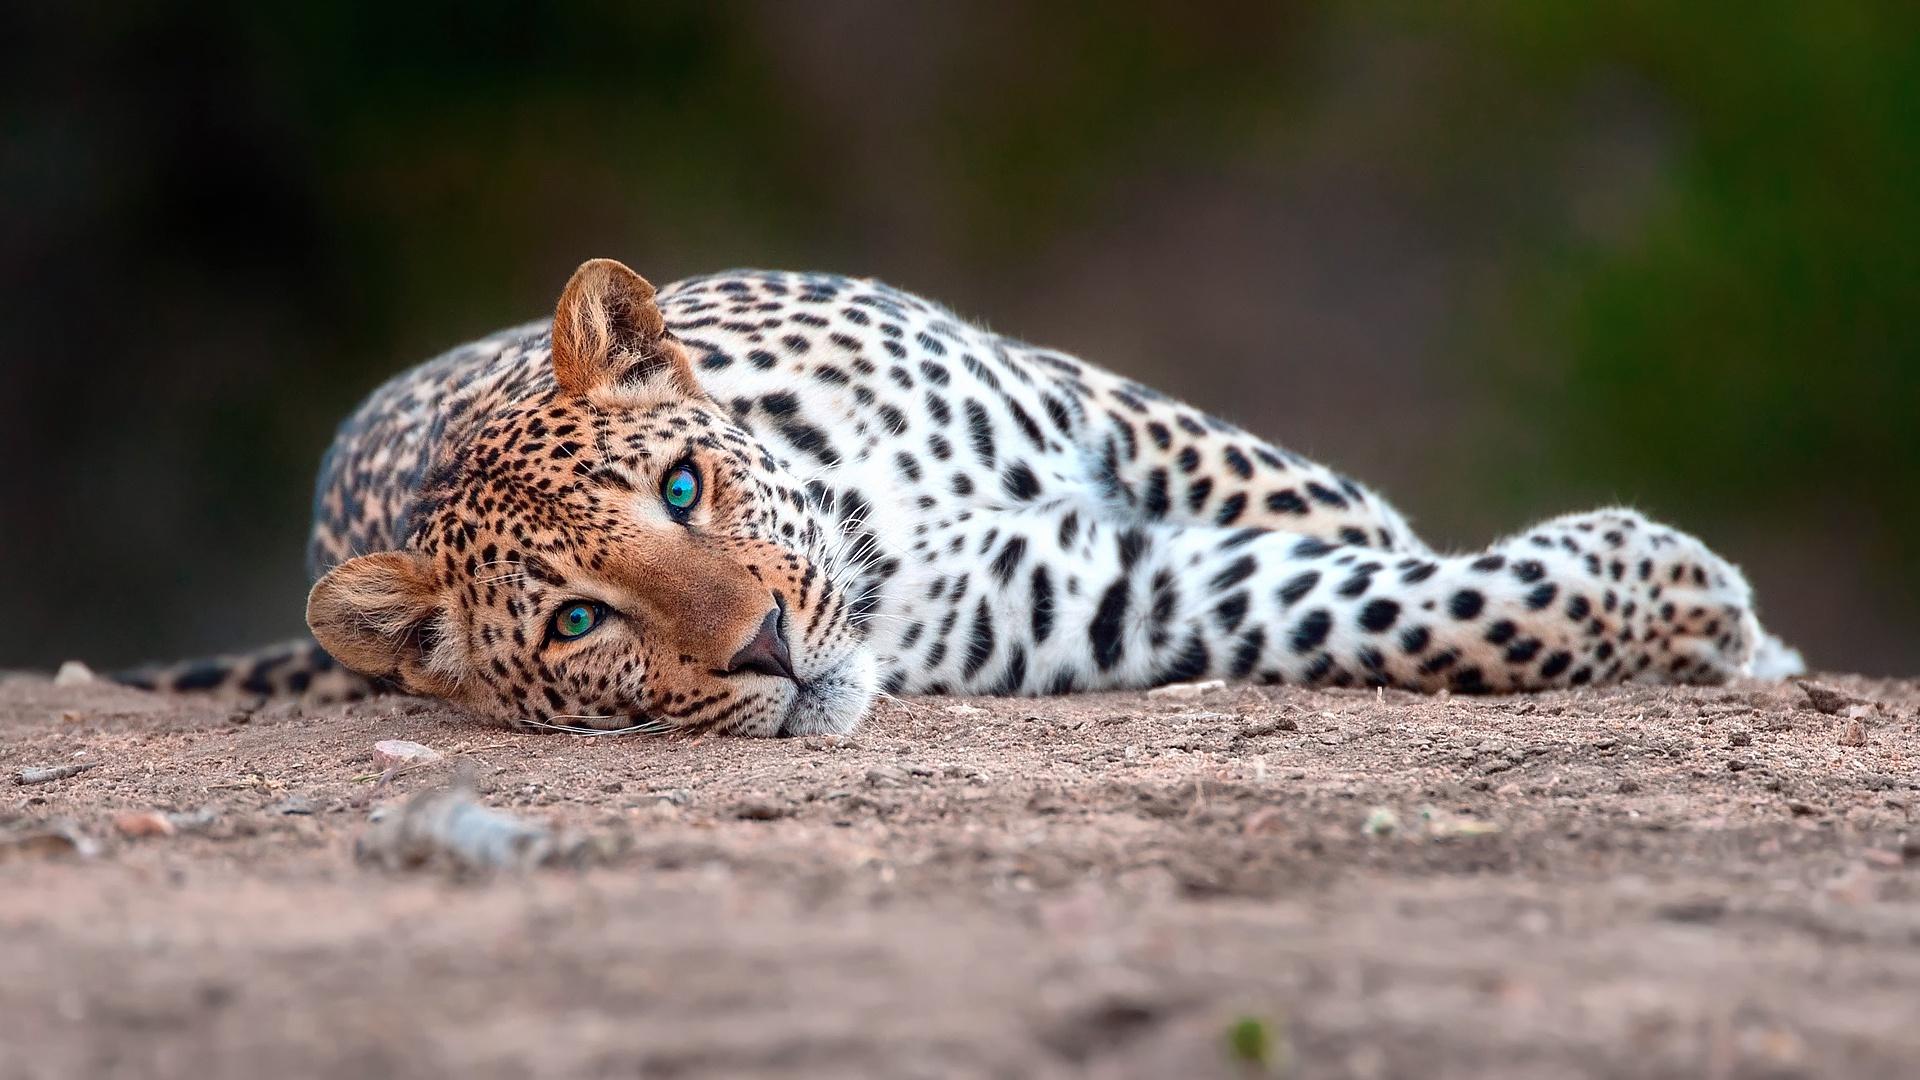 военнослужащим леопард картинки на телефон леопард говорят, что да